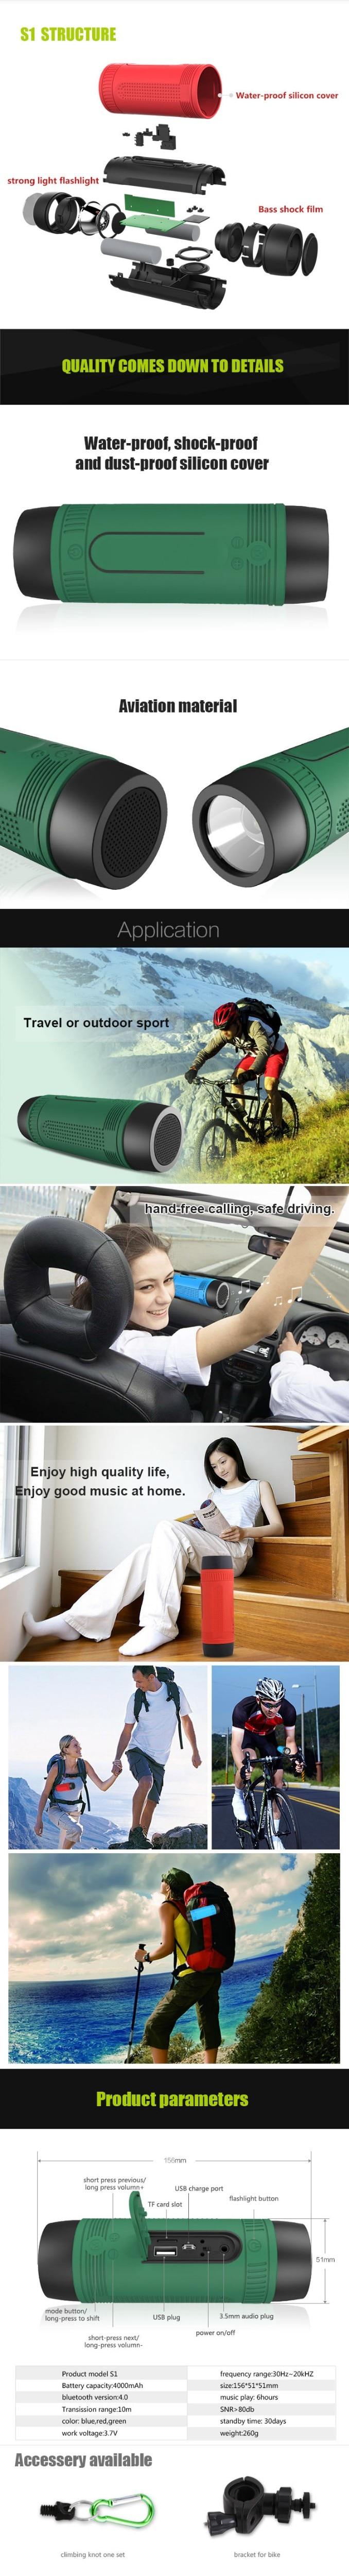 S1 Light Flashlight Bluetooth Speaker Radio Waterproof Portable Sound Box Outdoor